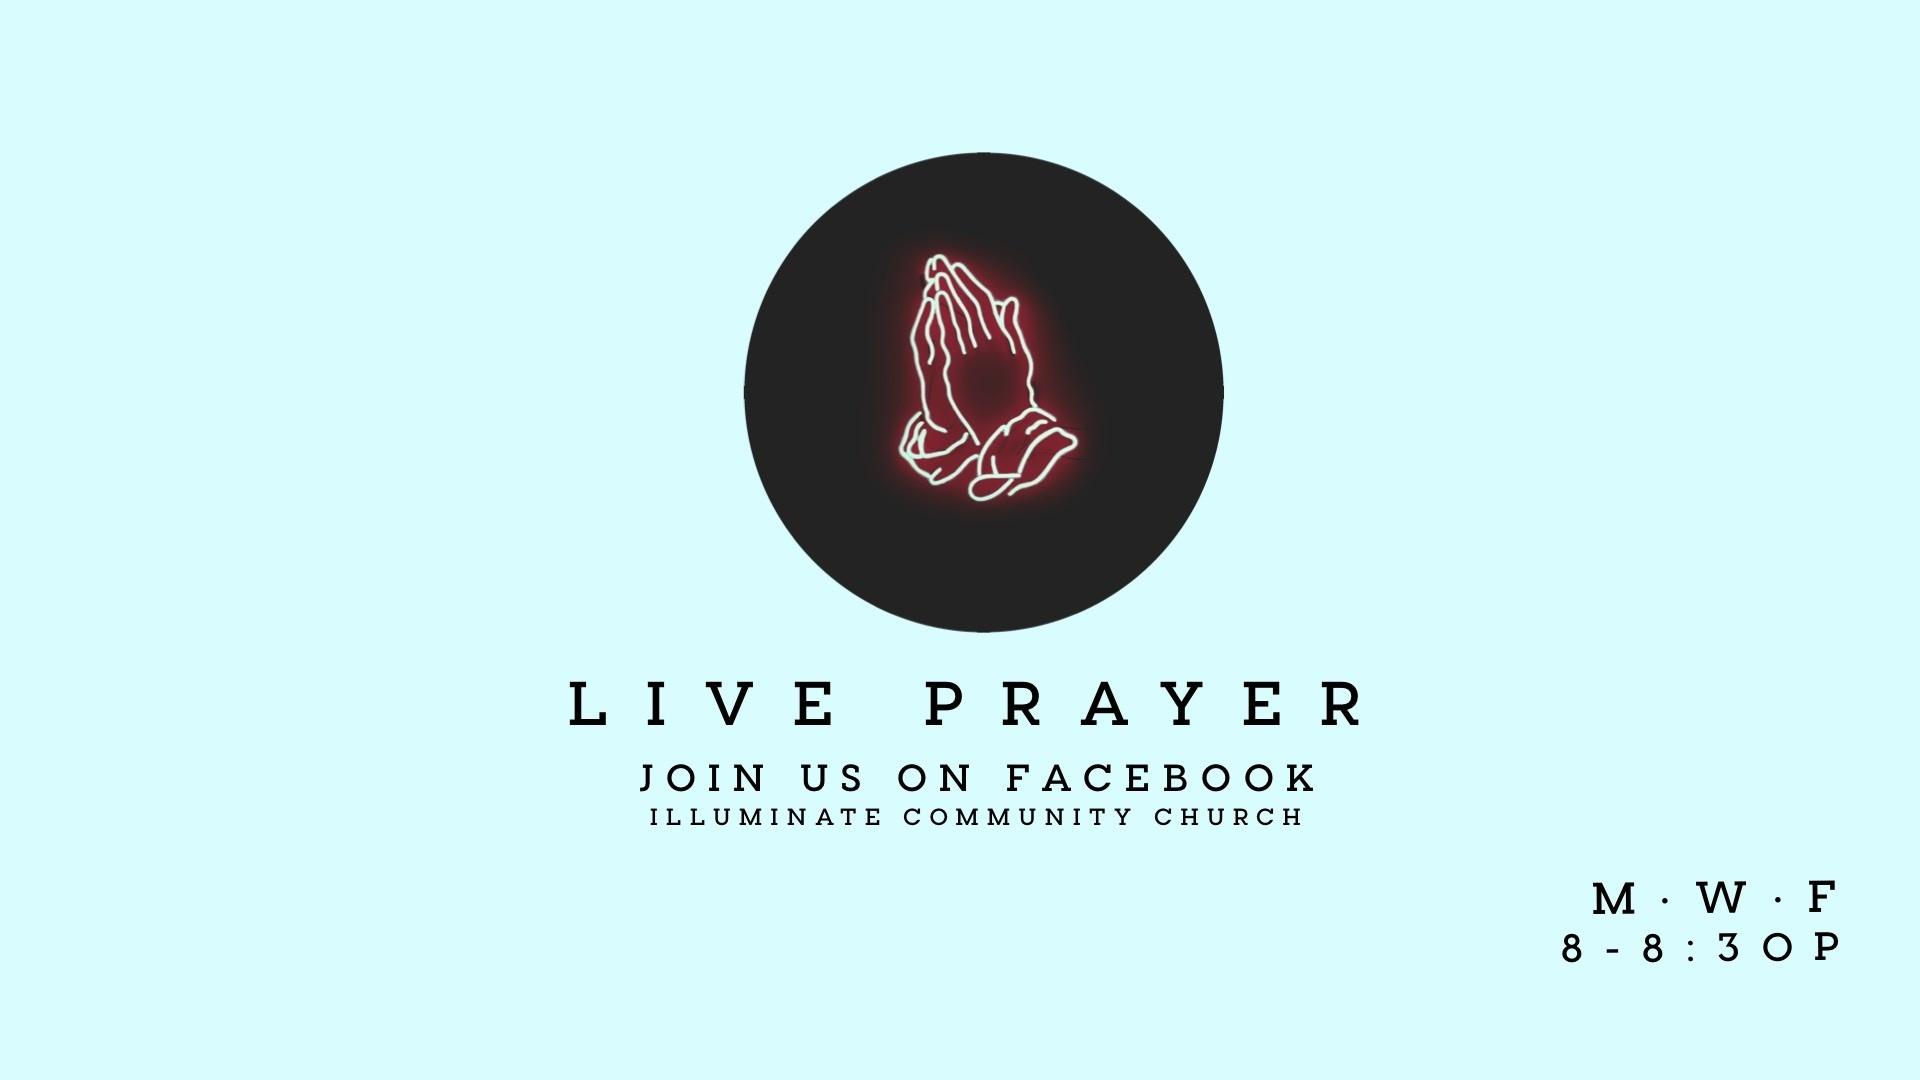 Facebook Live Prayer